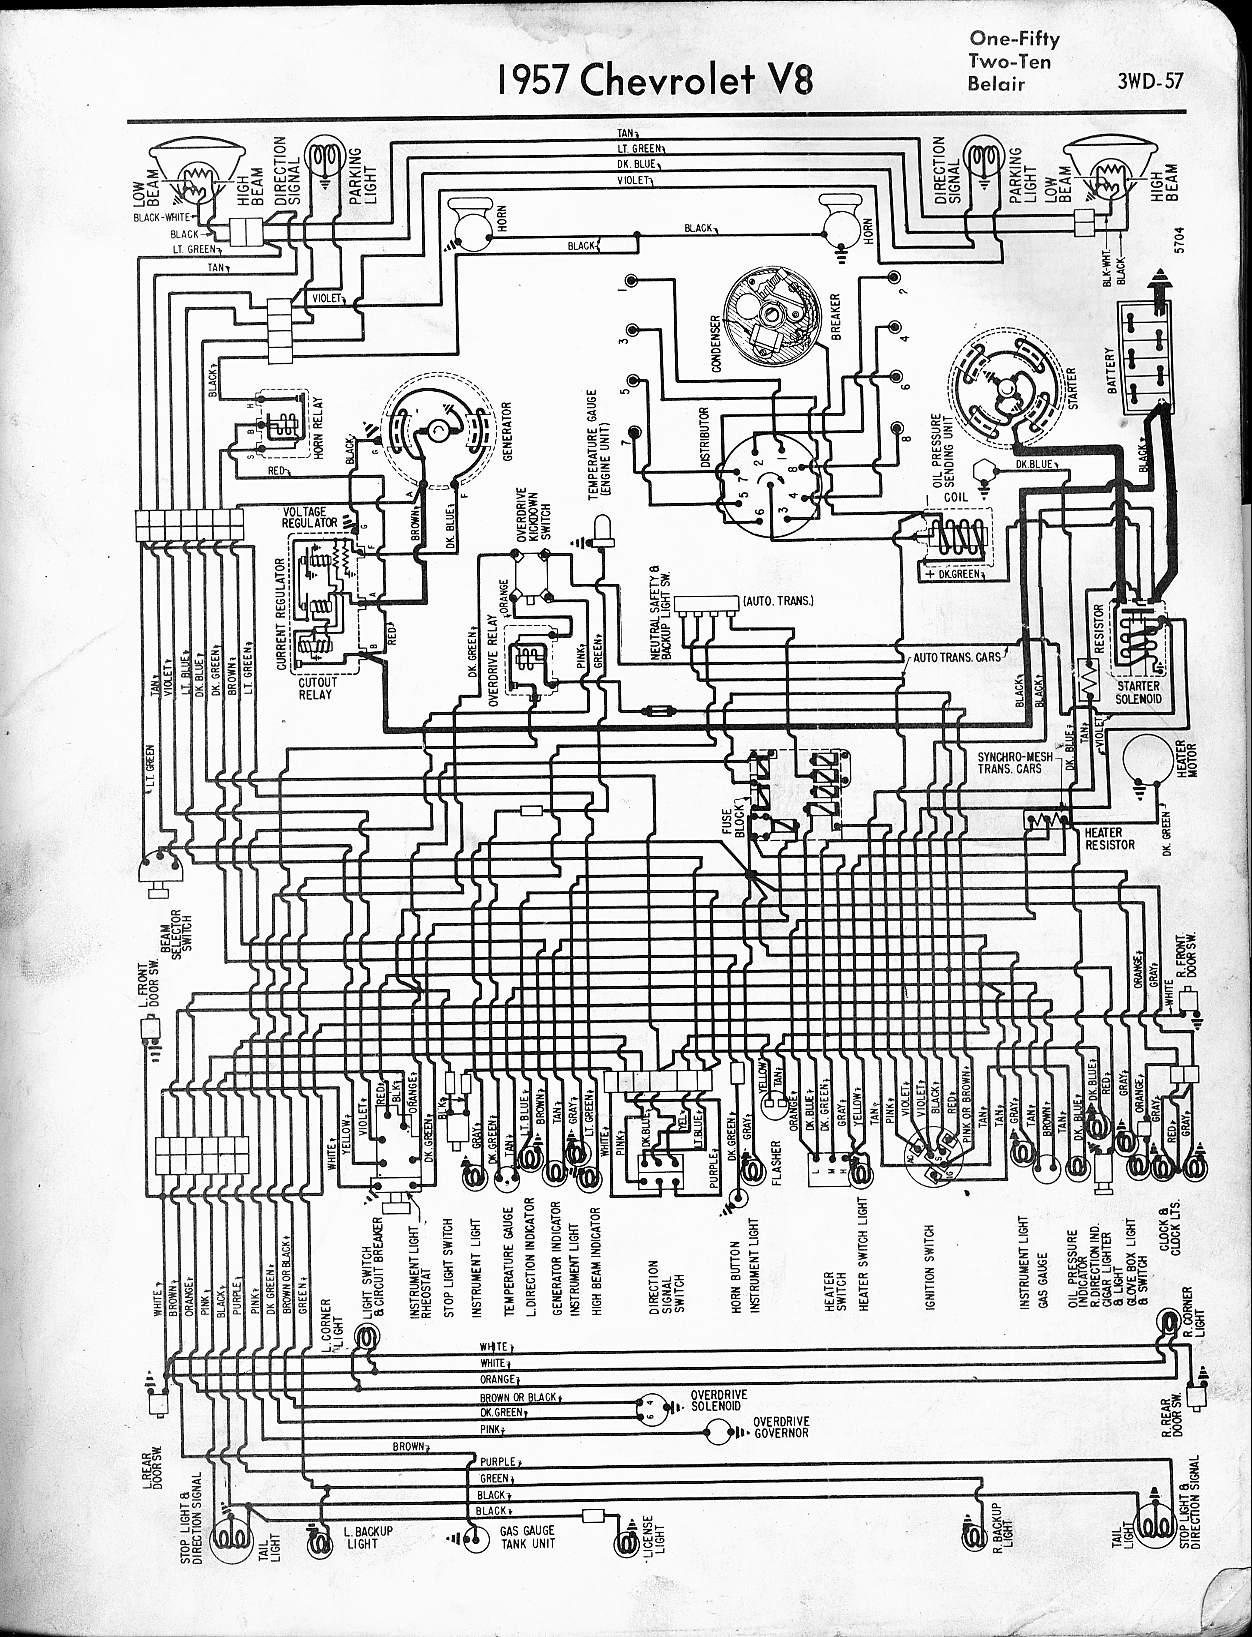 55 Chevy Wiring | Wiring Diagram - Turn Signal Wiring Diagram Chevy Truck